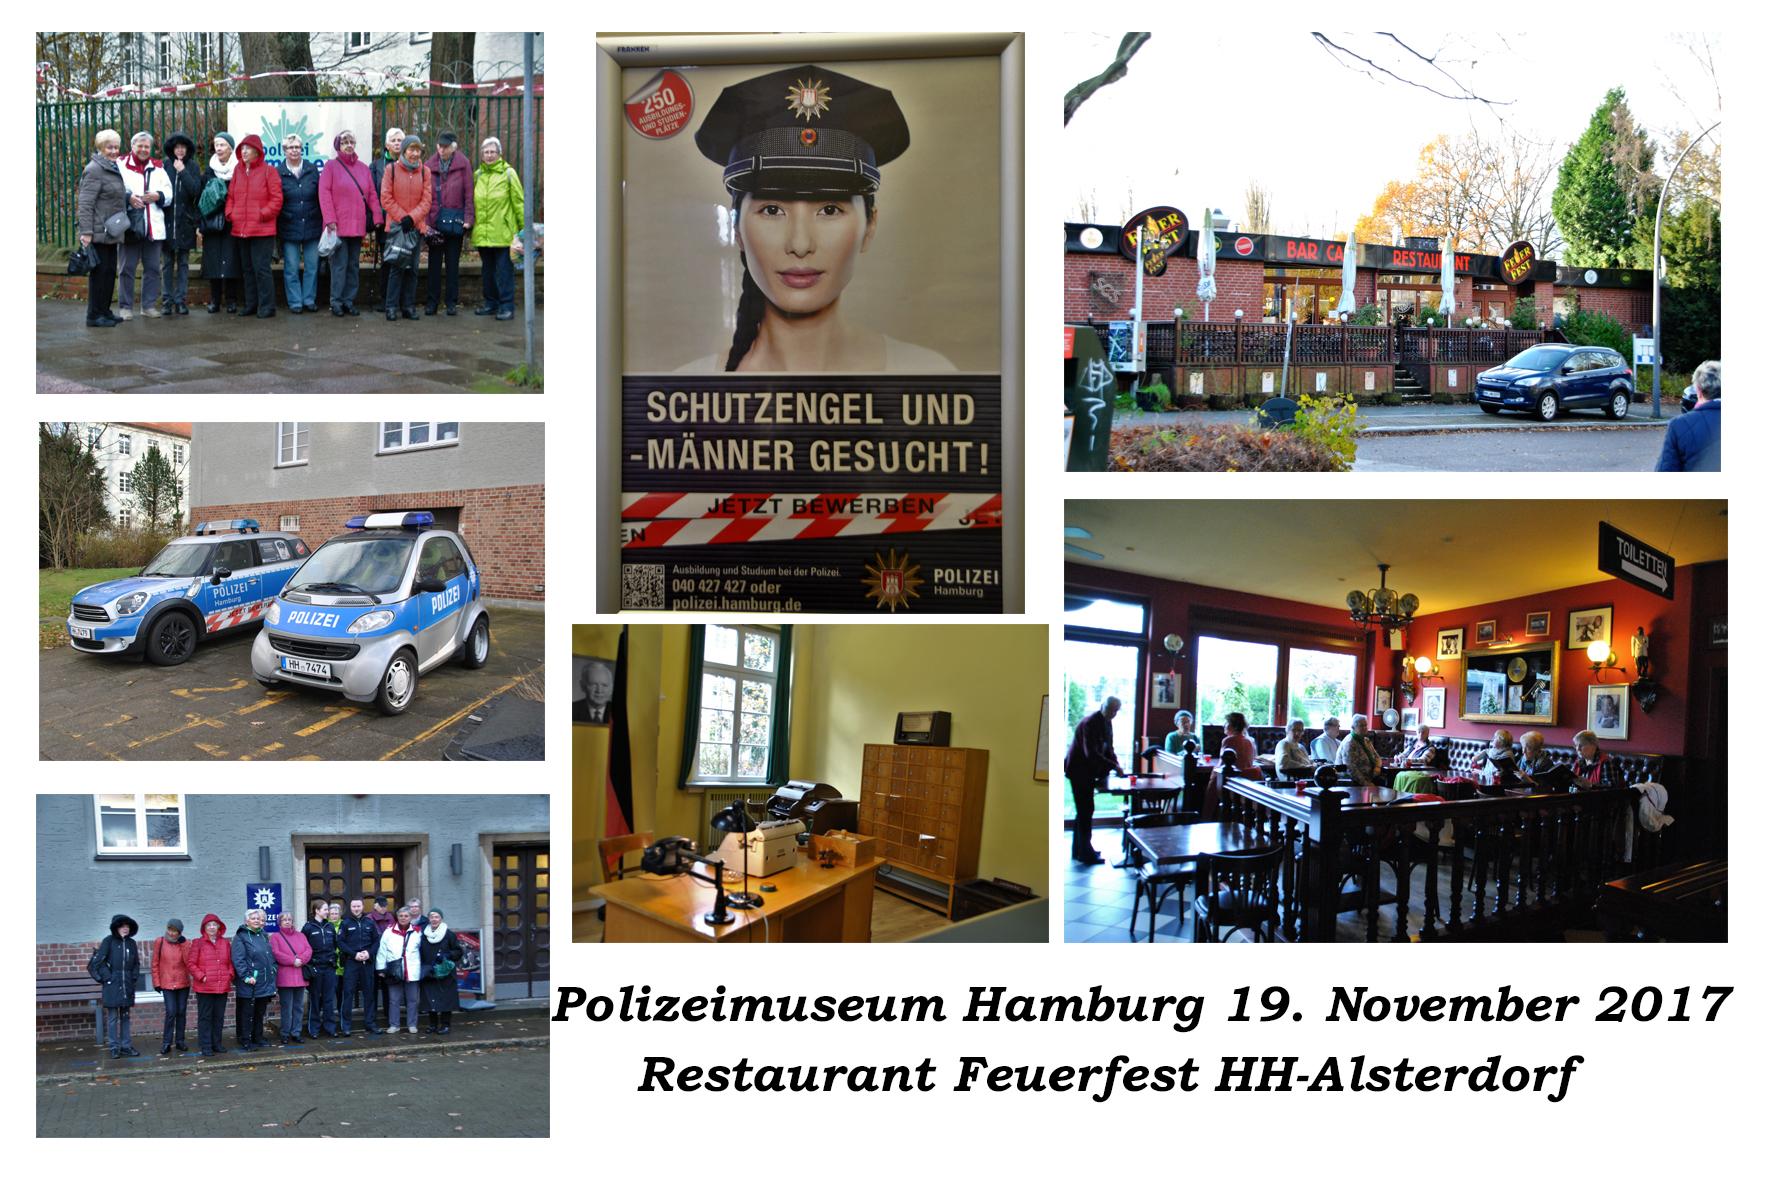 NeNo/Glashütte 2: Polizeimuseum, 19.11.2017 (Fotos: Tom)